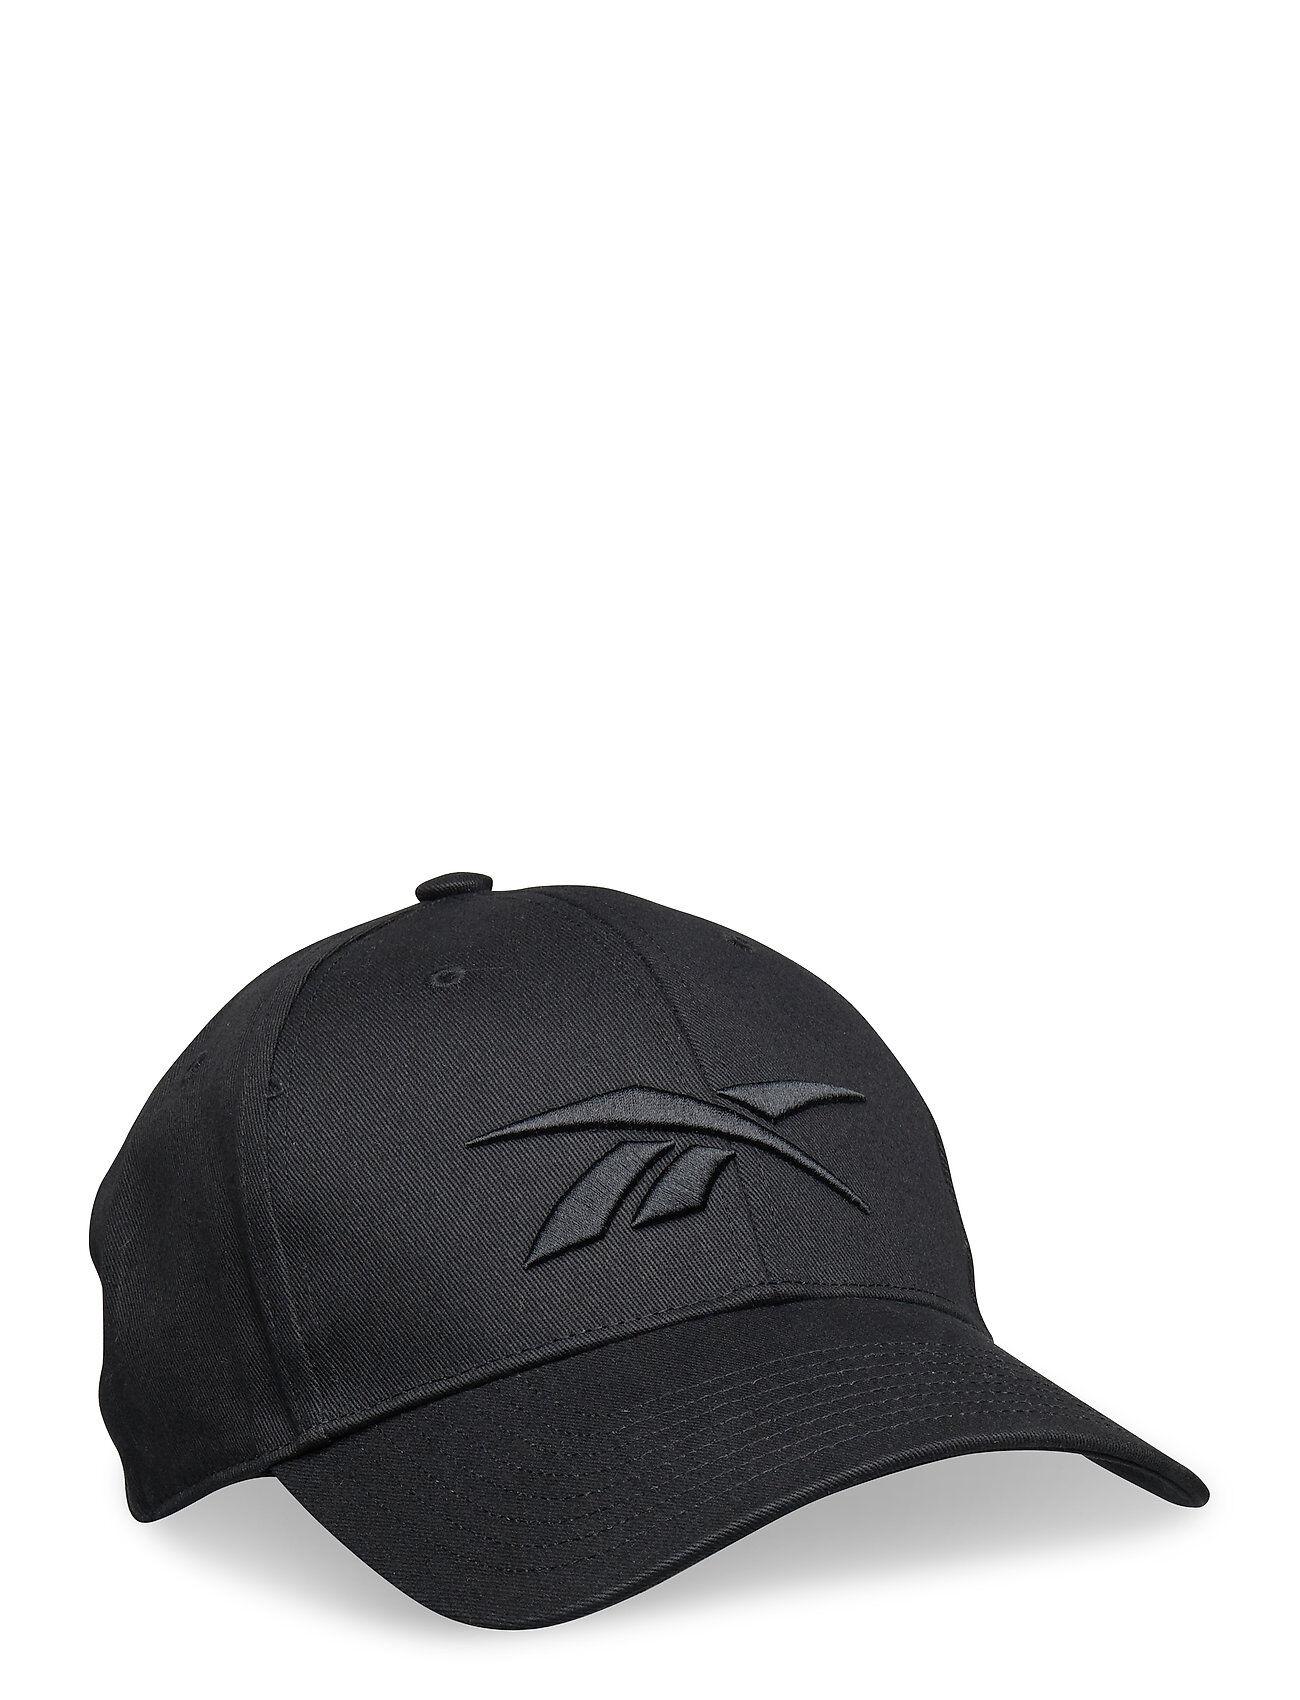 Reebok Performance Ubf Baseb Cap Accessories Headwear Caps Musta Reebok Performance